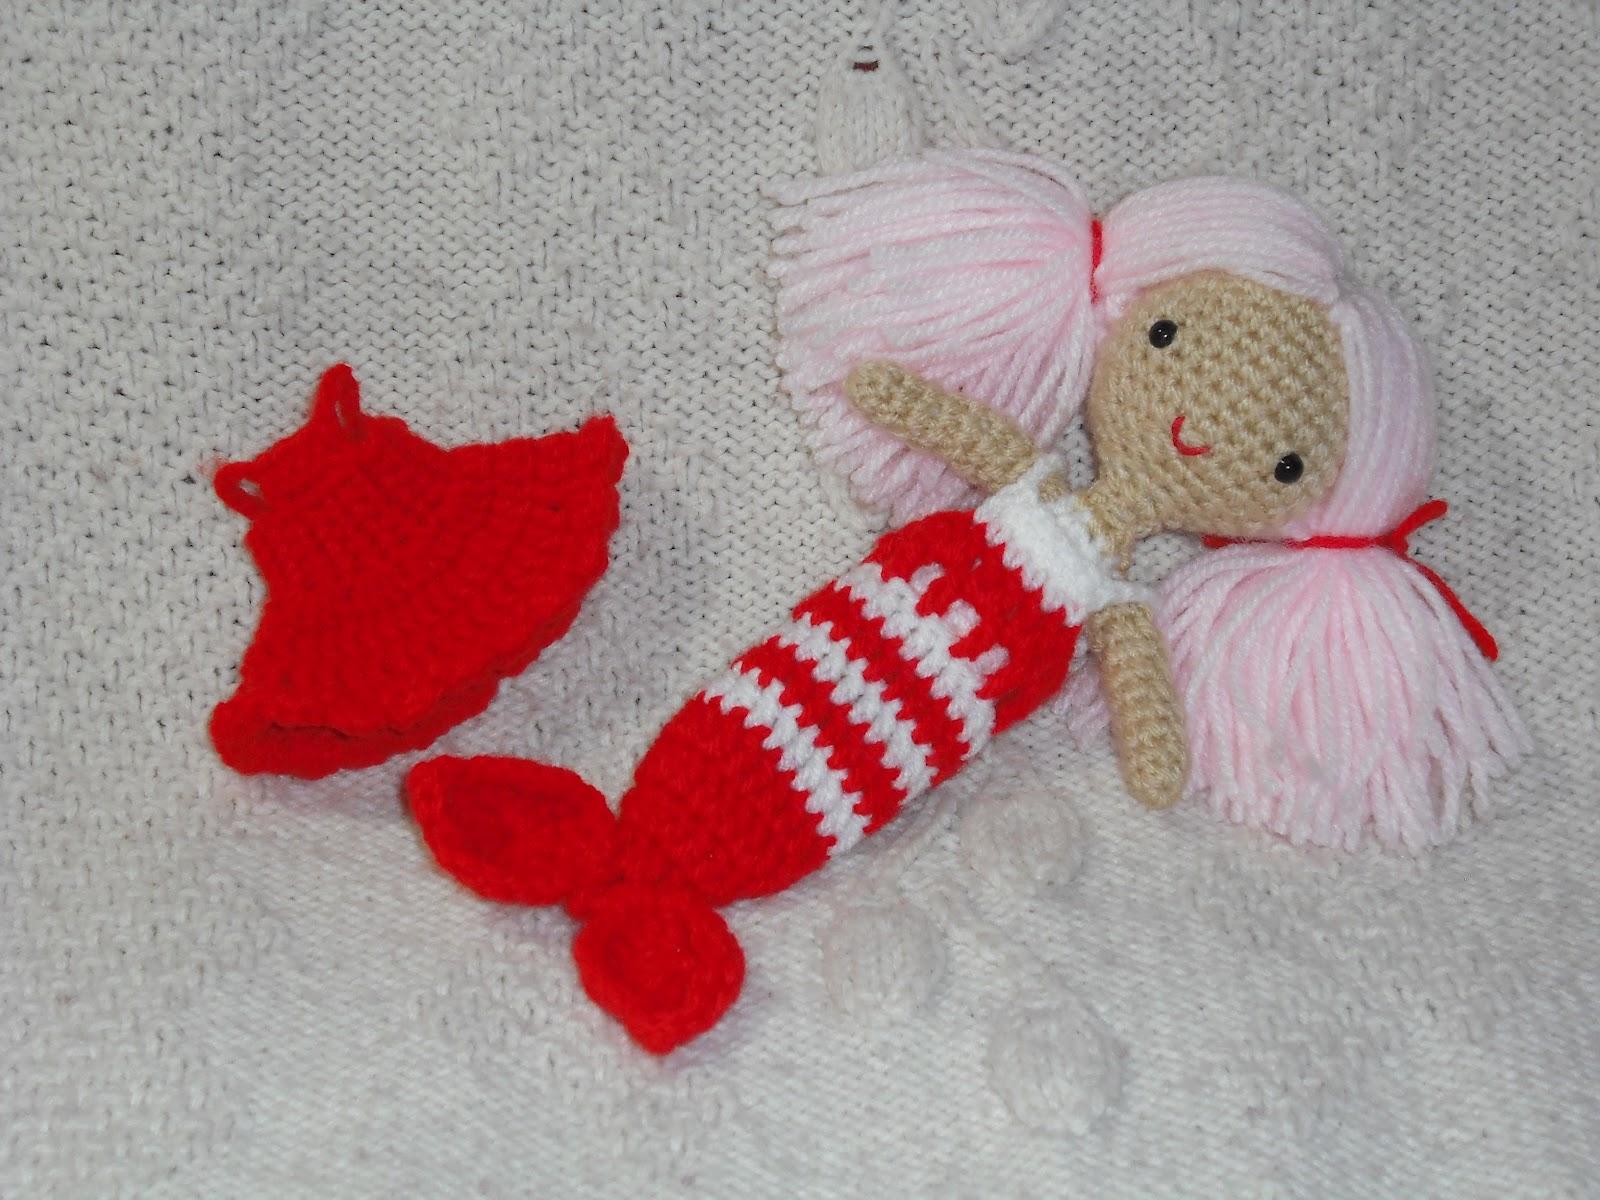 Crochet Stitches Htr : sc single crochet htr half treble hdc half double crochet tr treble dc ...